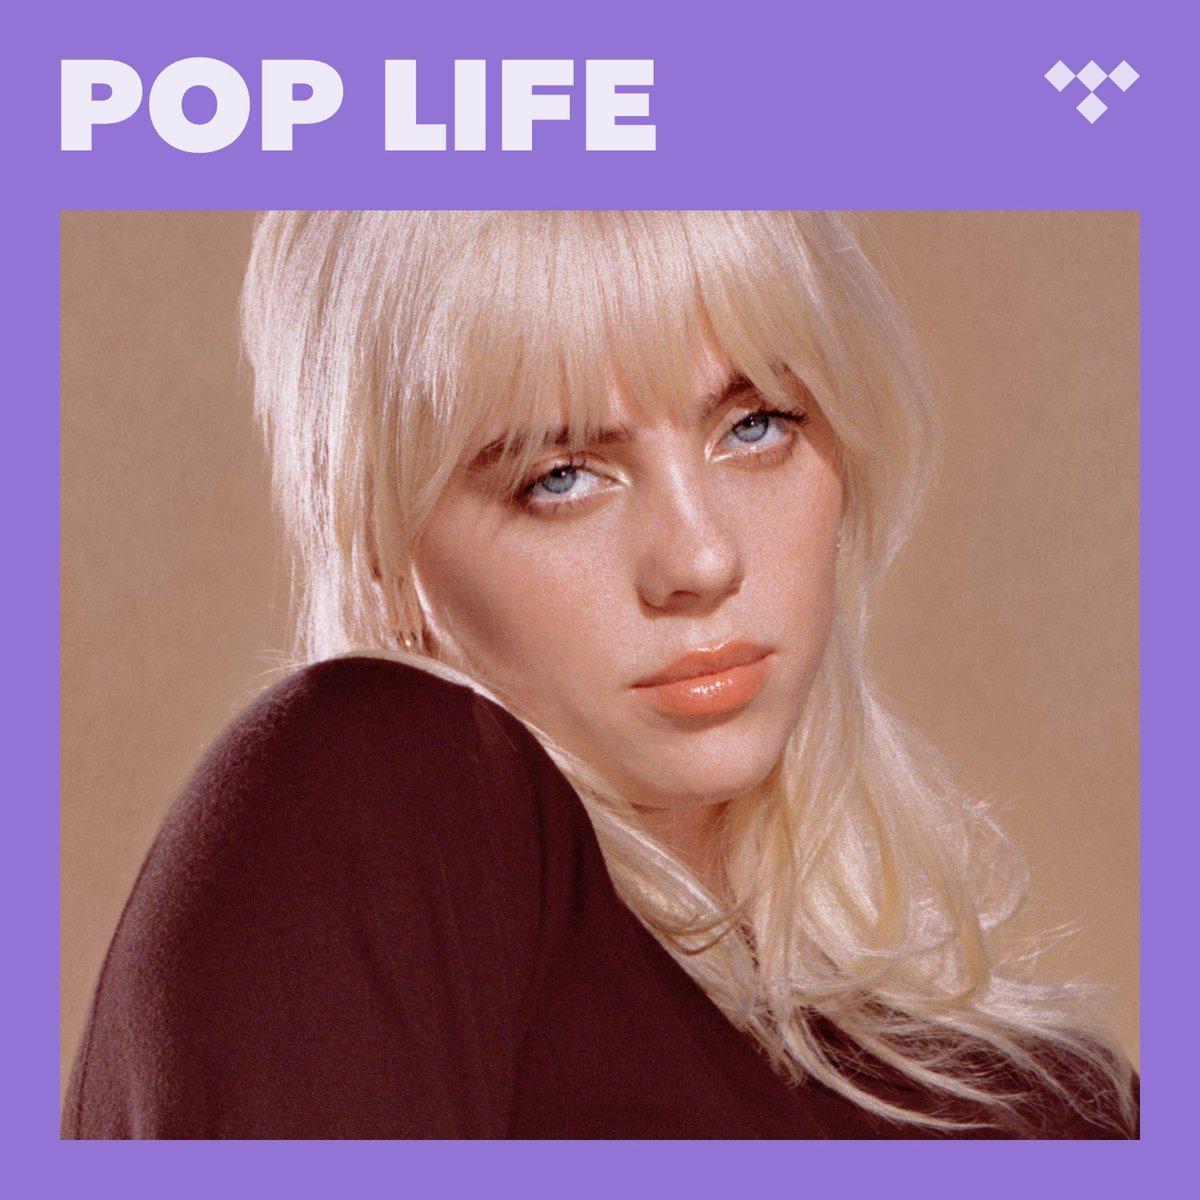 "Billie Eilish - ""Happier Than Ever"" Listen now on @TIDAL's Pop Life playlist. https://t.co/srNLoazqDu https://t.co/iiFt4FzdiY"